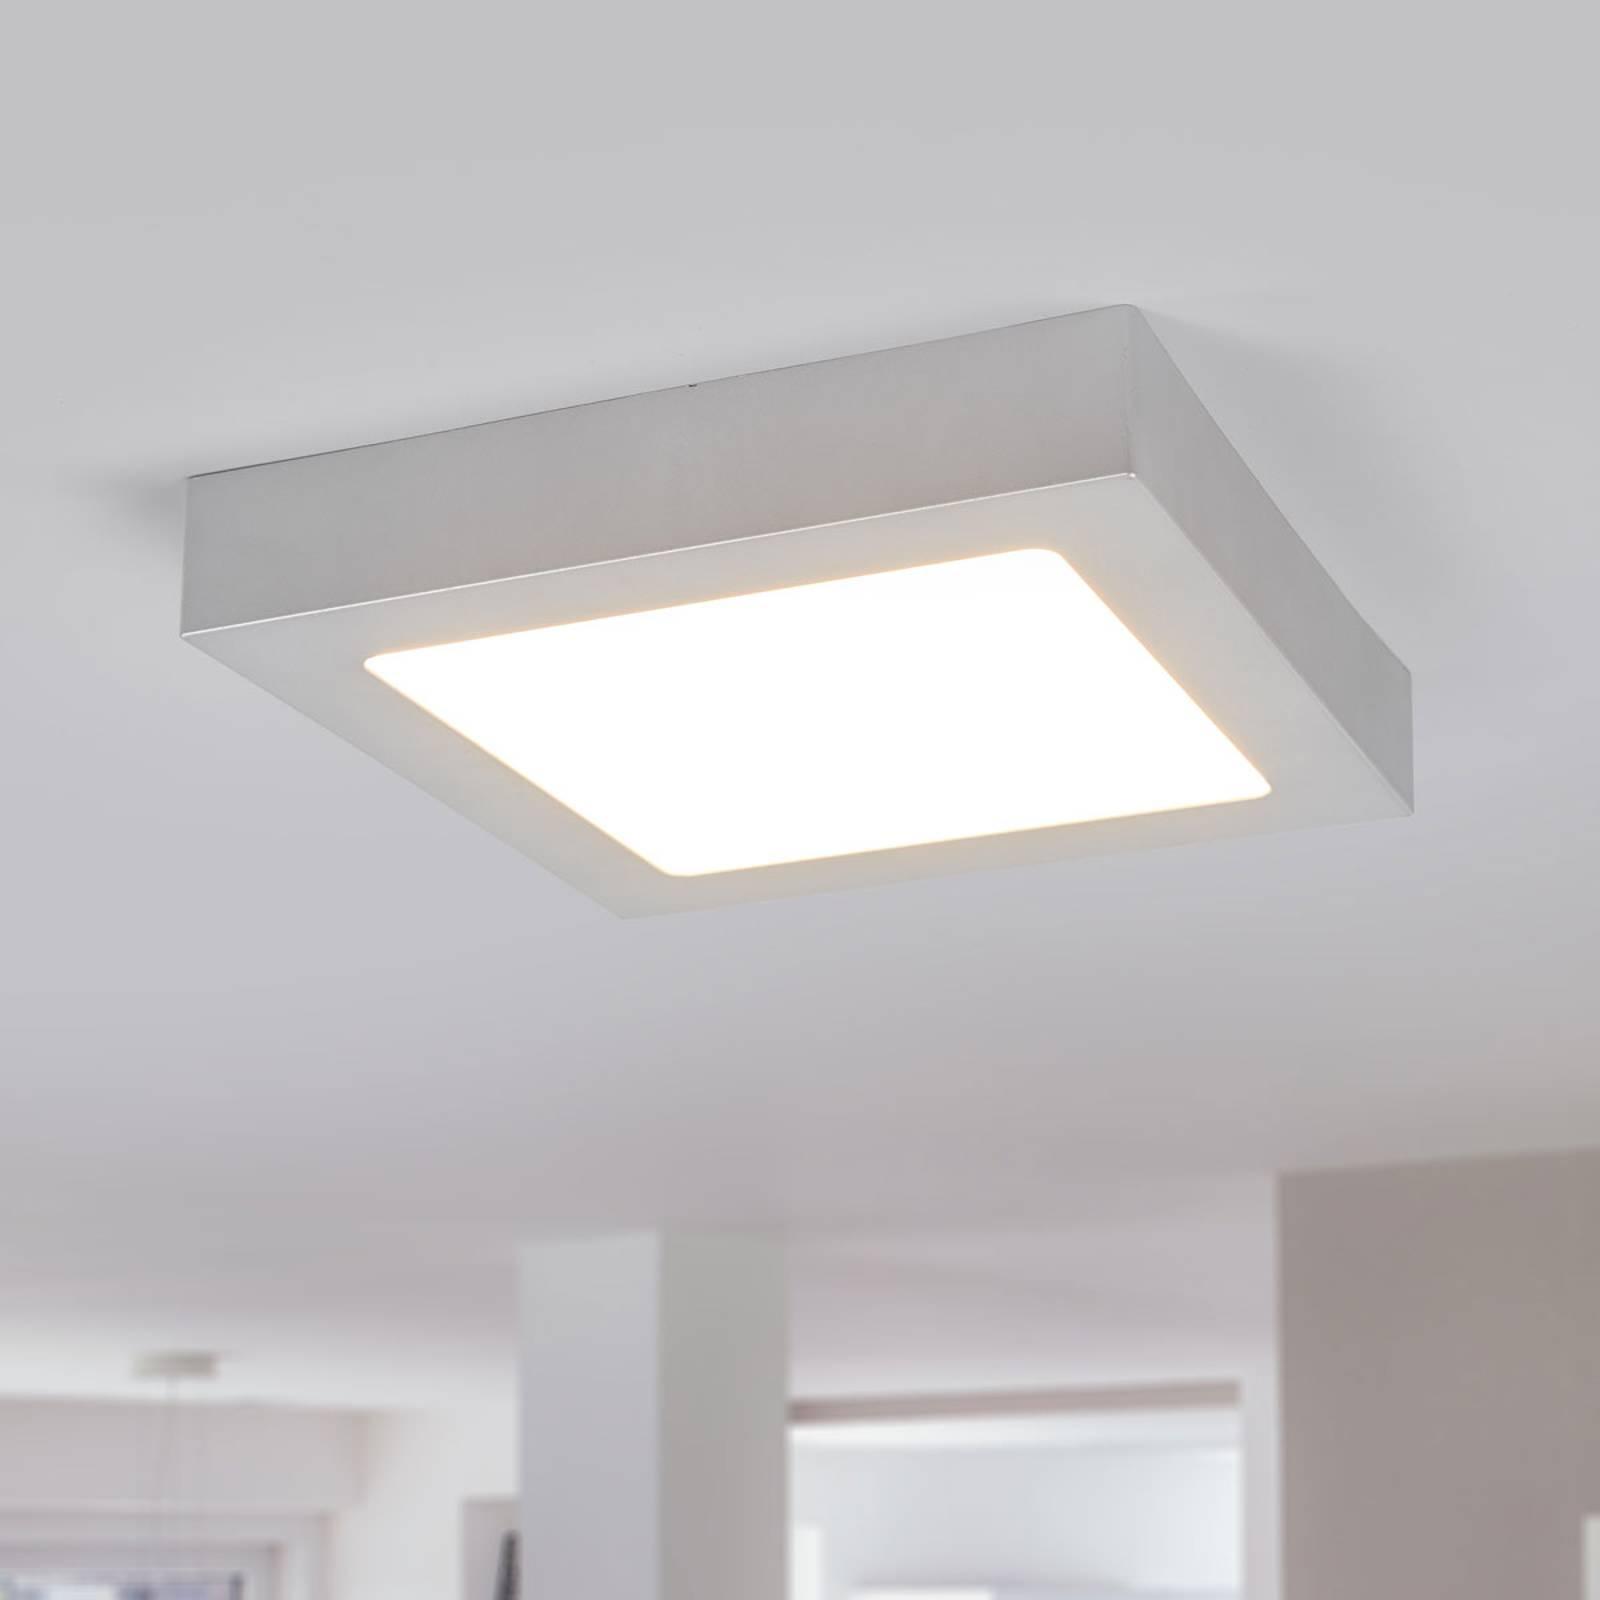 LED-kattovalo Marlo hopea 3 000 K kulmikas 23,1 cm